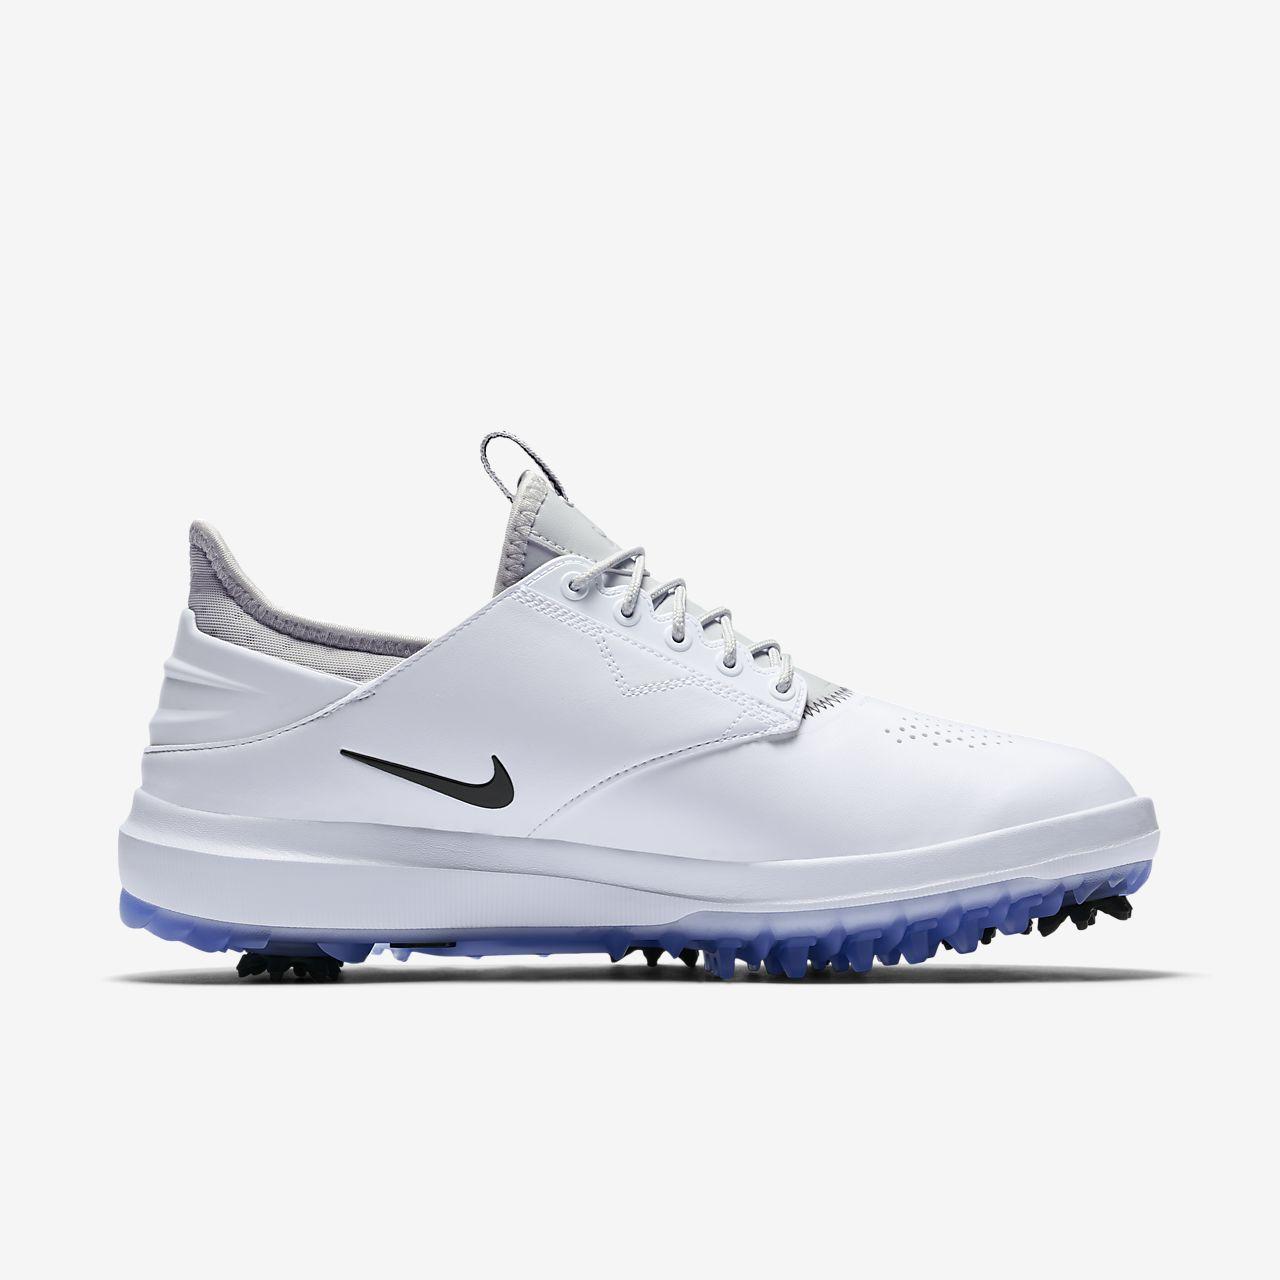 273a9464459 Ανδρικό παπούτσι γκολφ Nike Air Zoom Direct. Nike.com GR